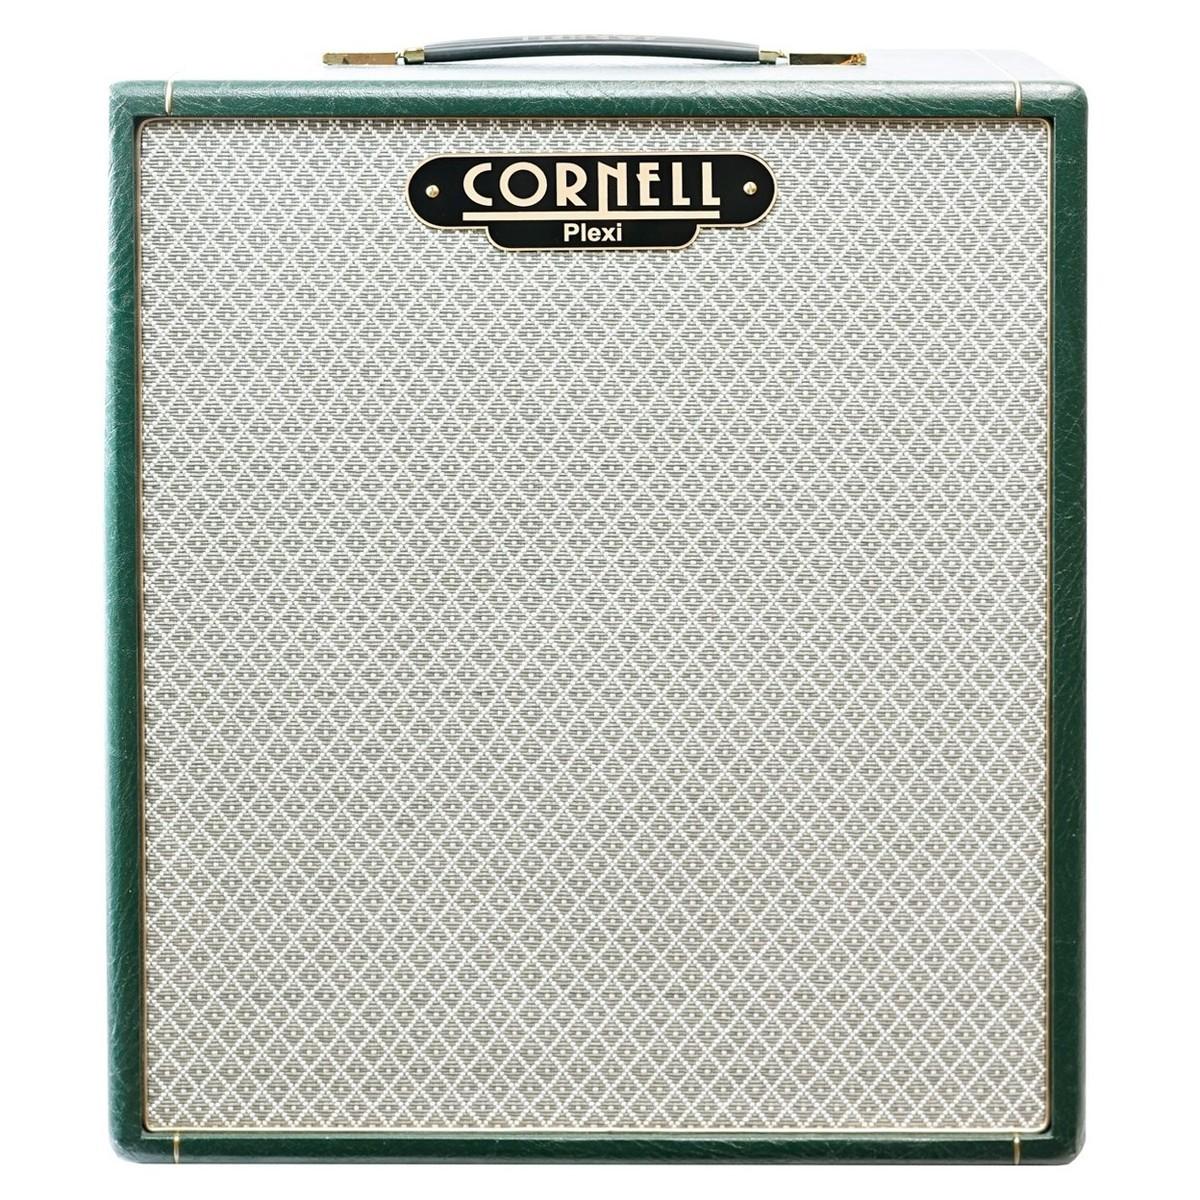 Cornell Plexi 18/20 1X12 Cabinet en Gear4Music.com